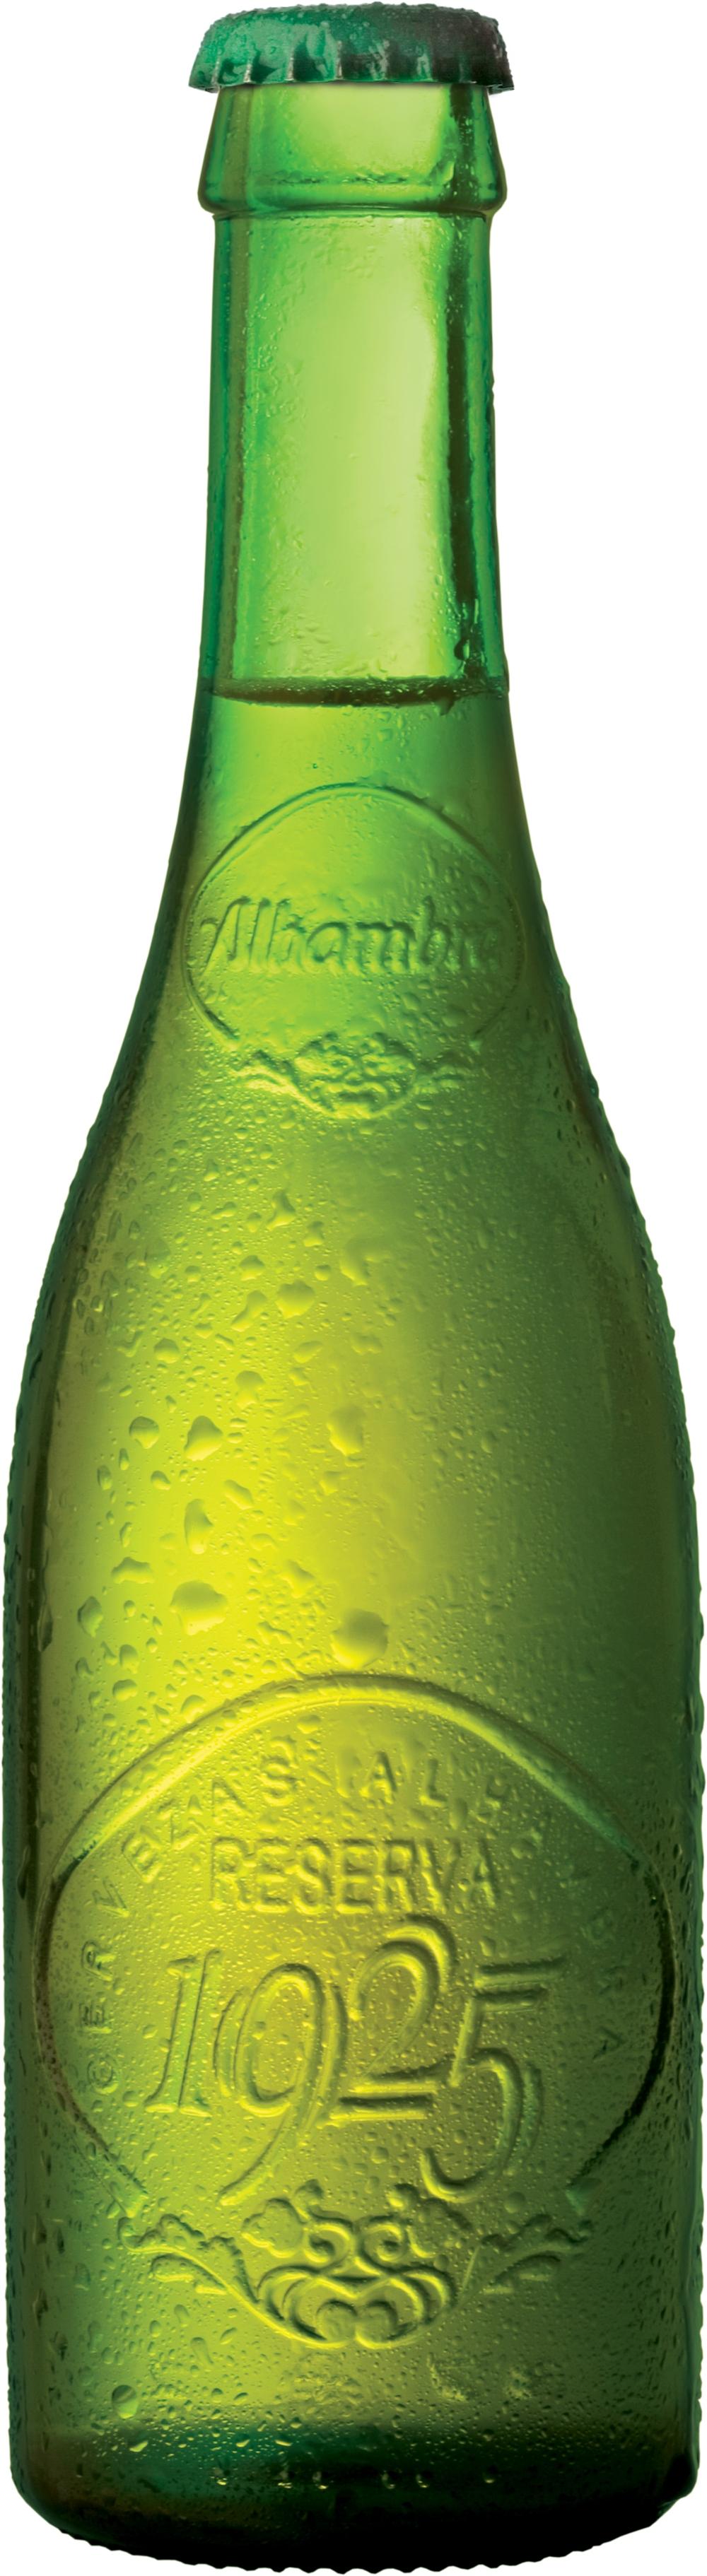 Alhambra Reserva Brewery International